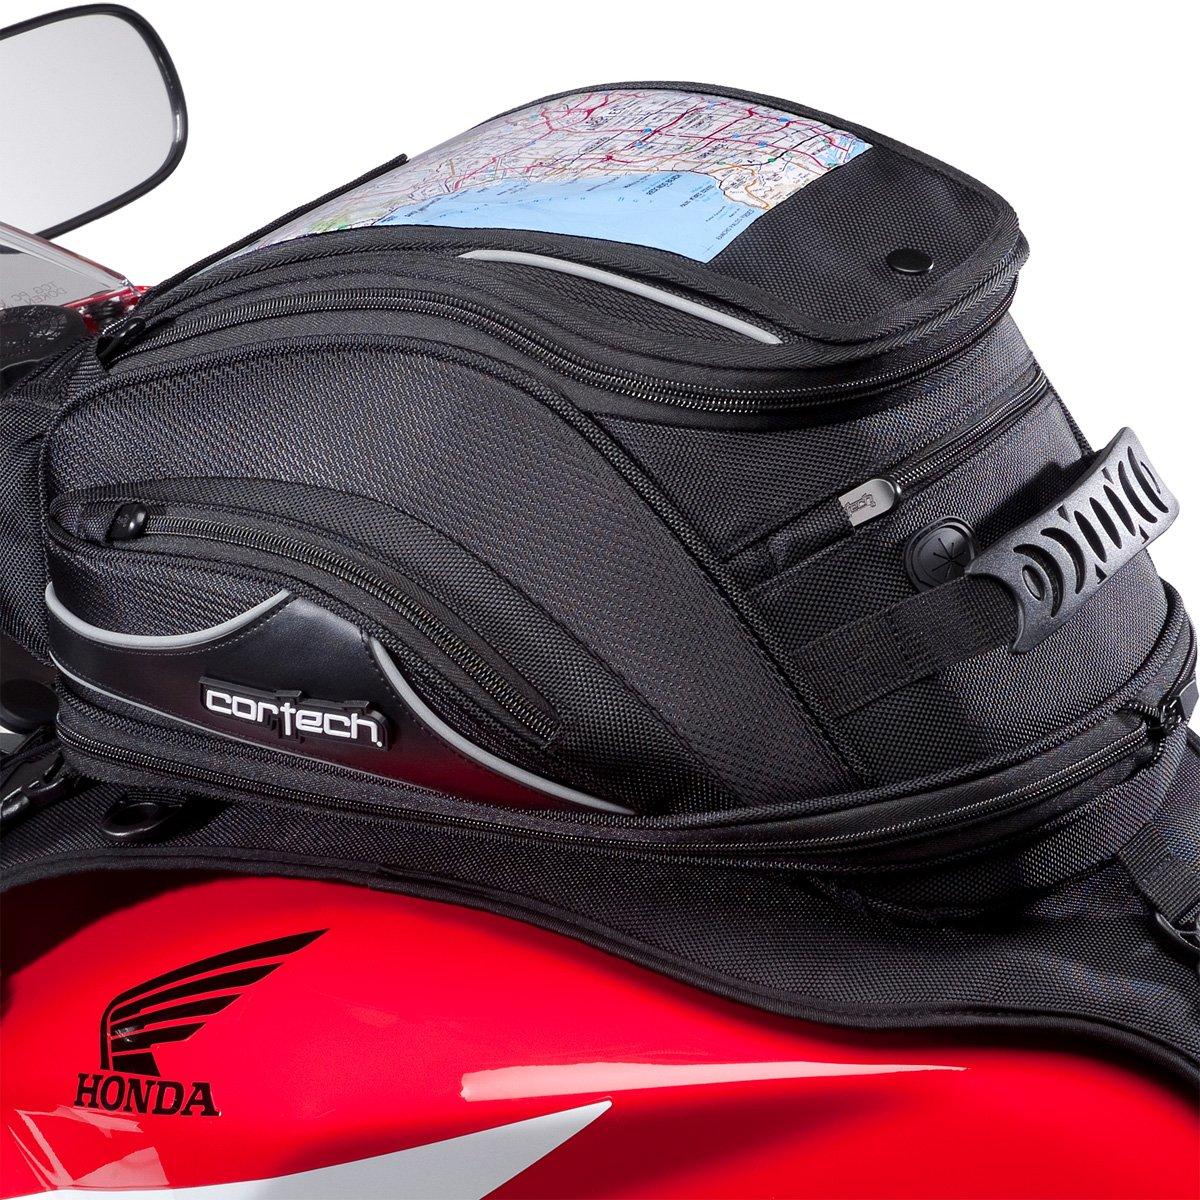 Cortech Super 2.0 10L Strap Mount Motorcycle Tank Bag - Black/One Size